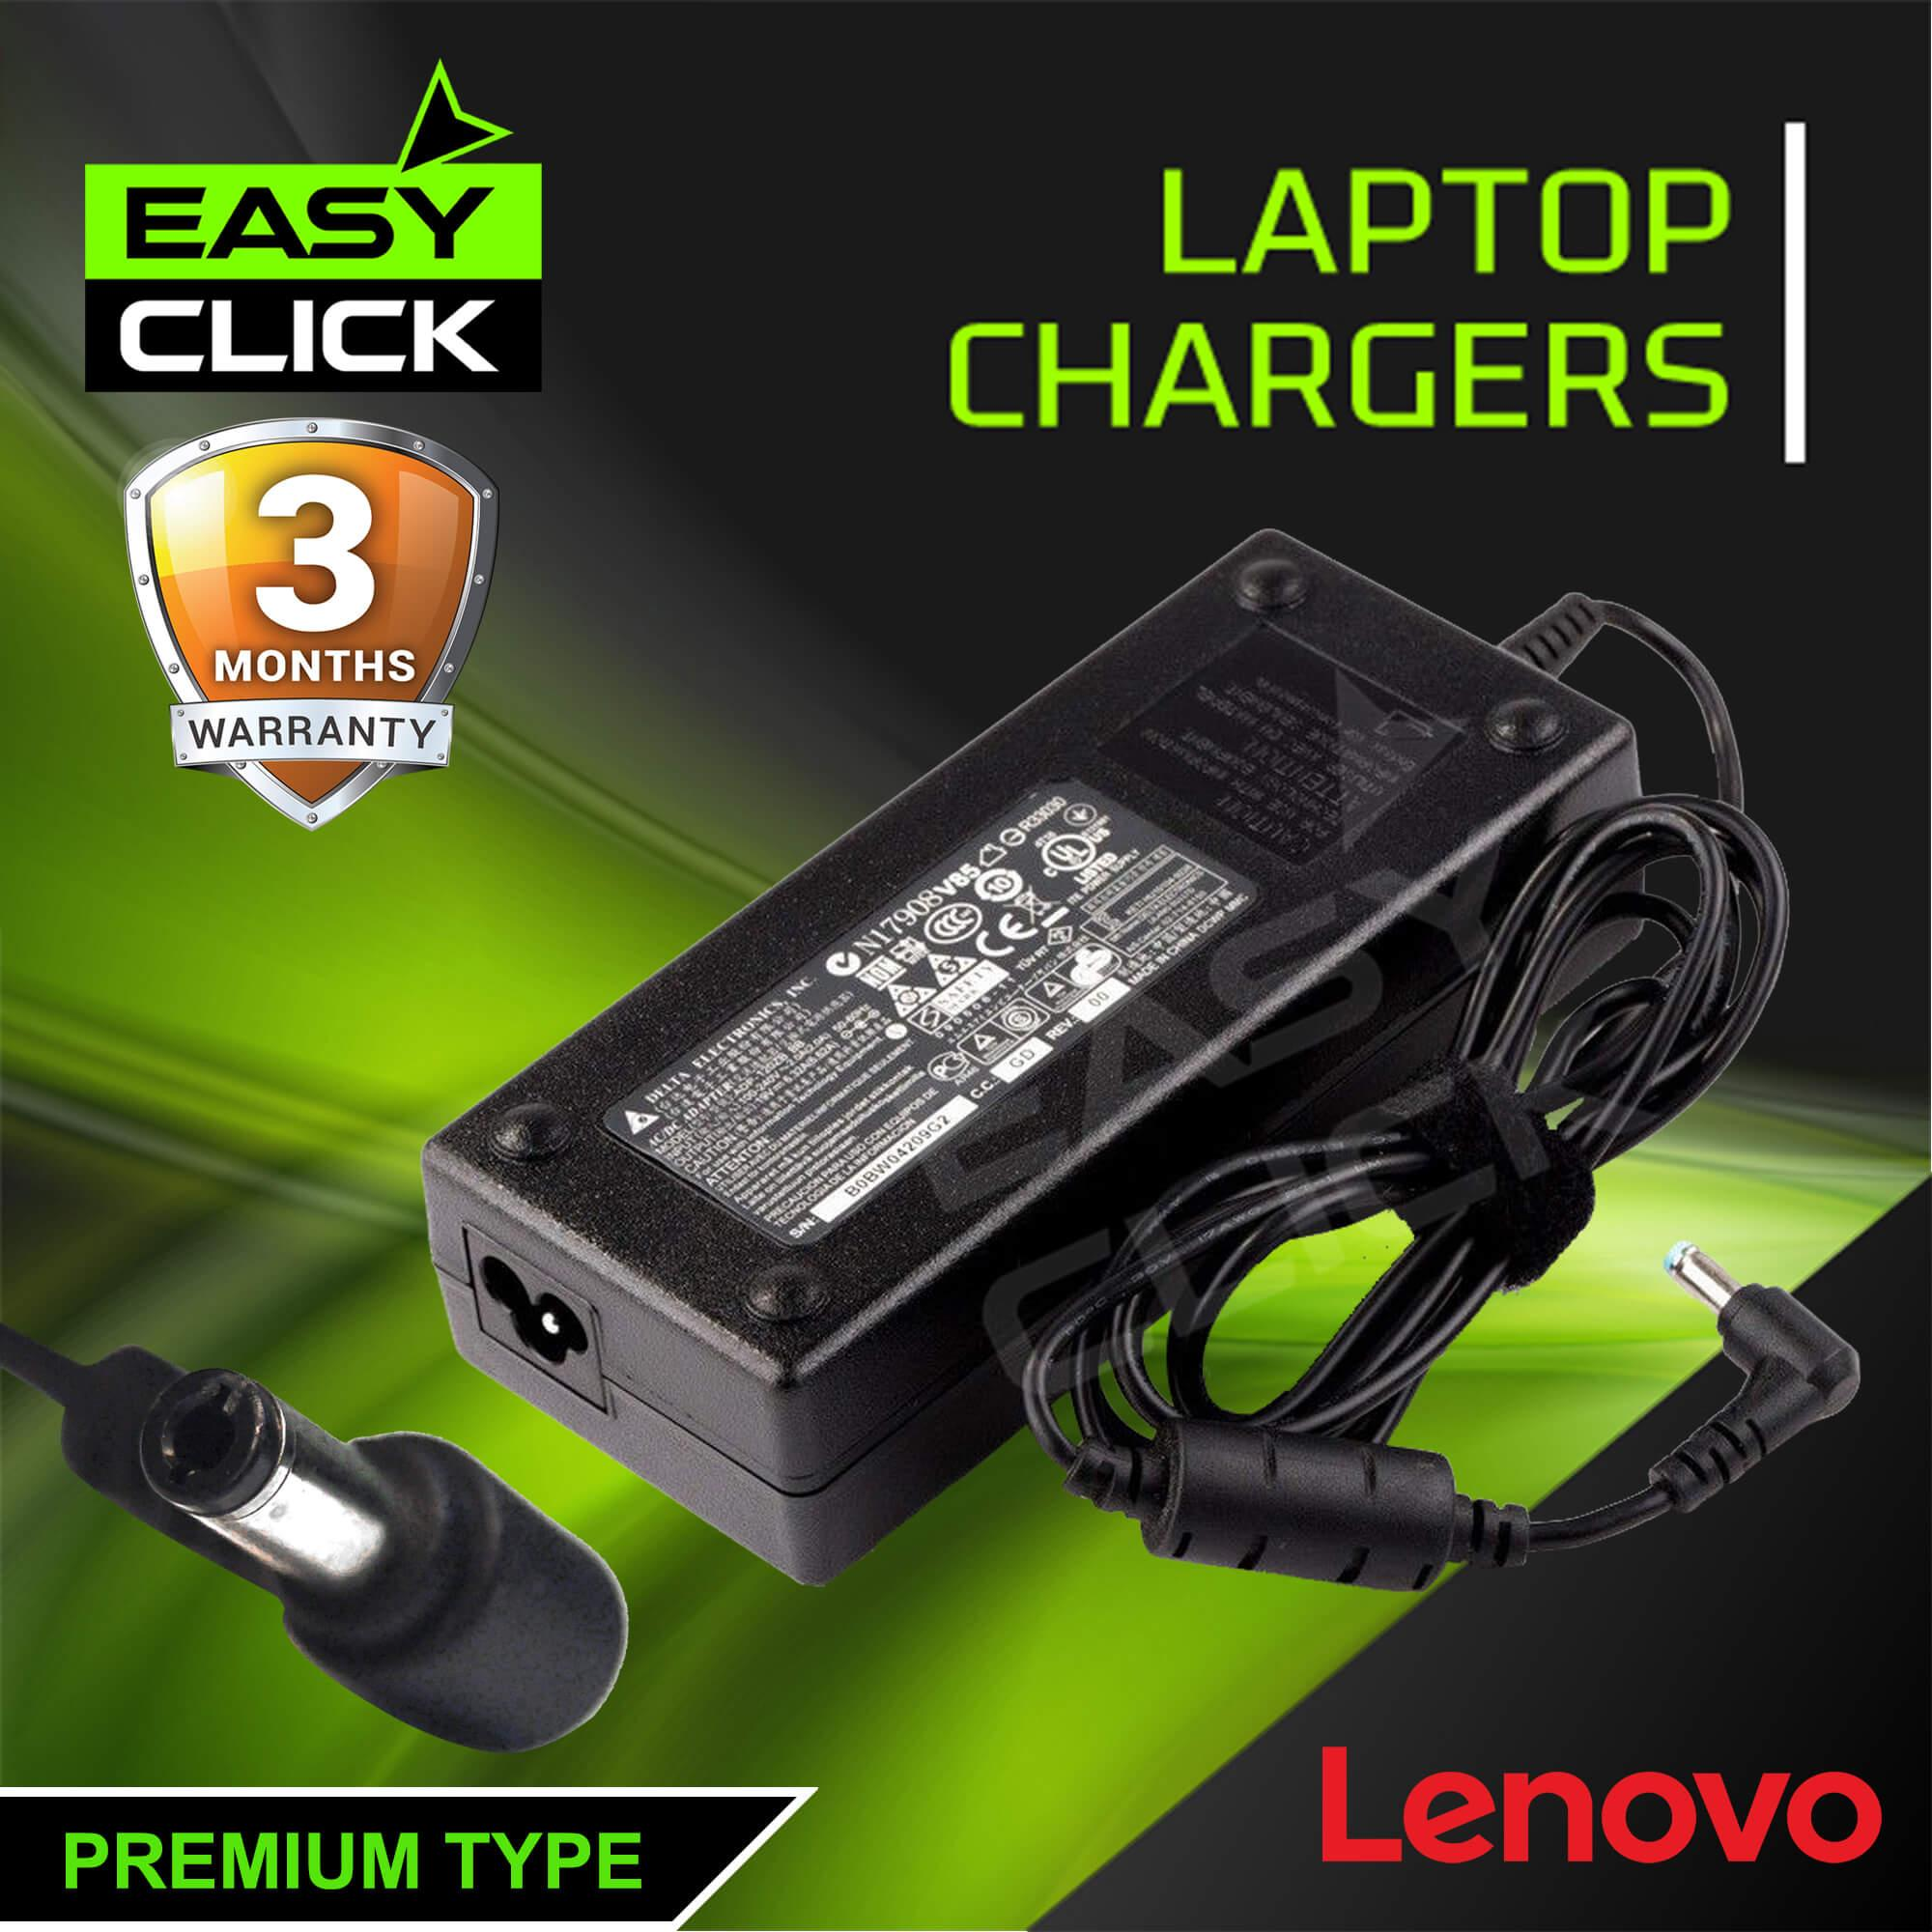 Lenovo Philippines - Lenovo Computer Accessories for sale - prices